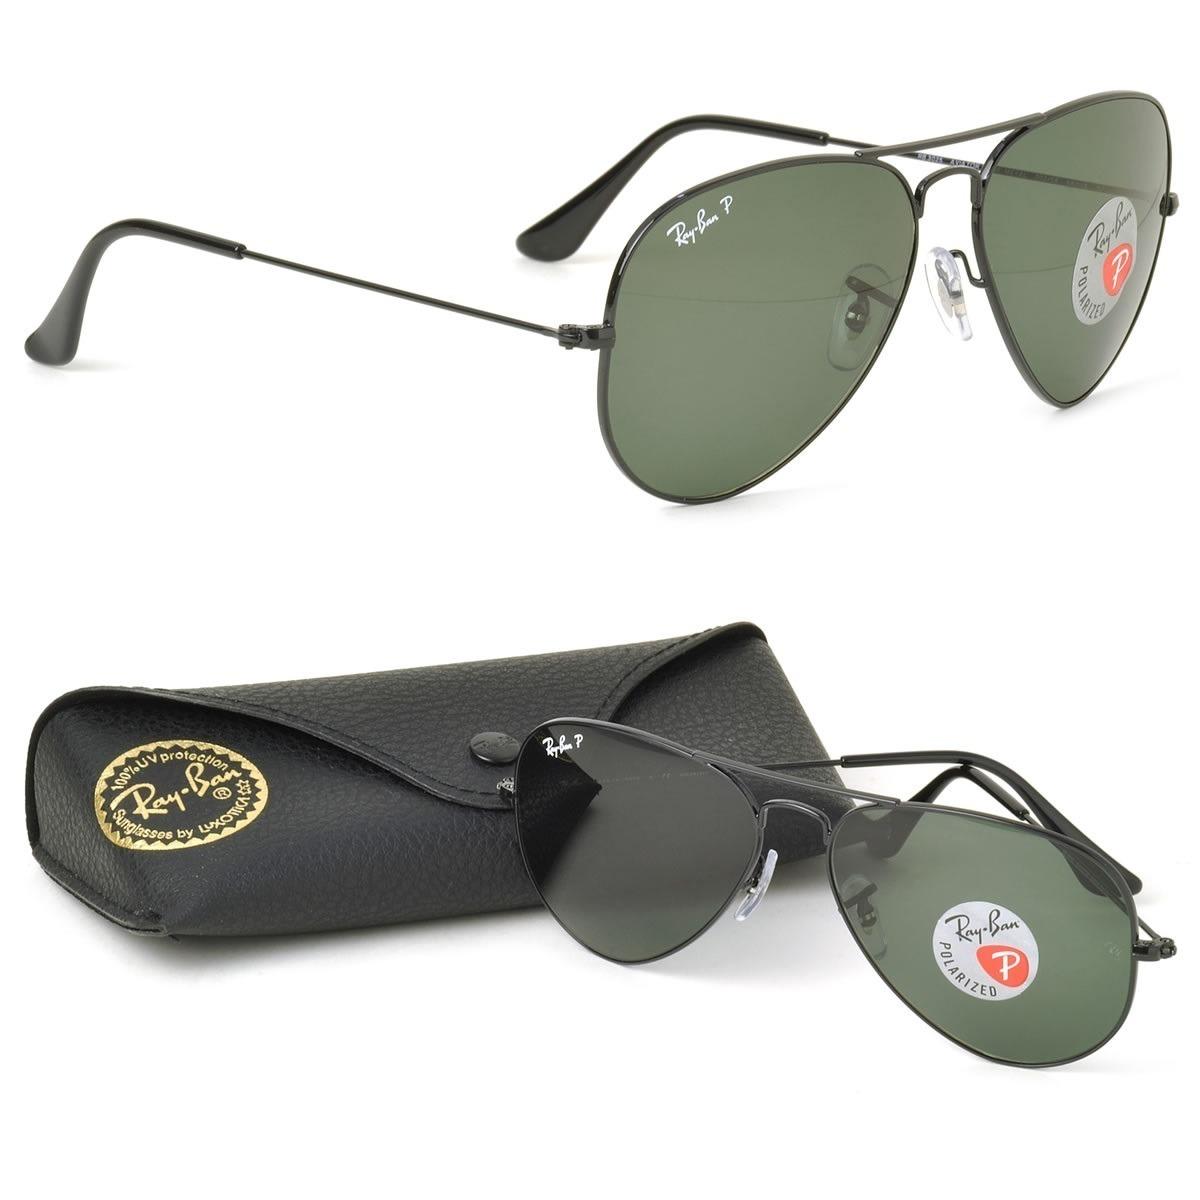 870ef1c67a4cc oculos ray ban rb3026 aviador polarizado masculino feminino. Carregando zoom .